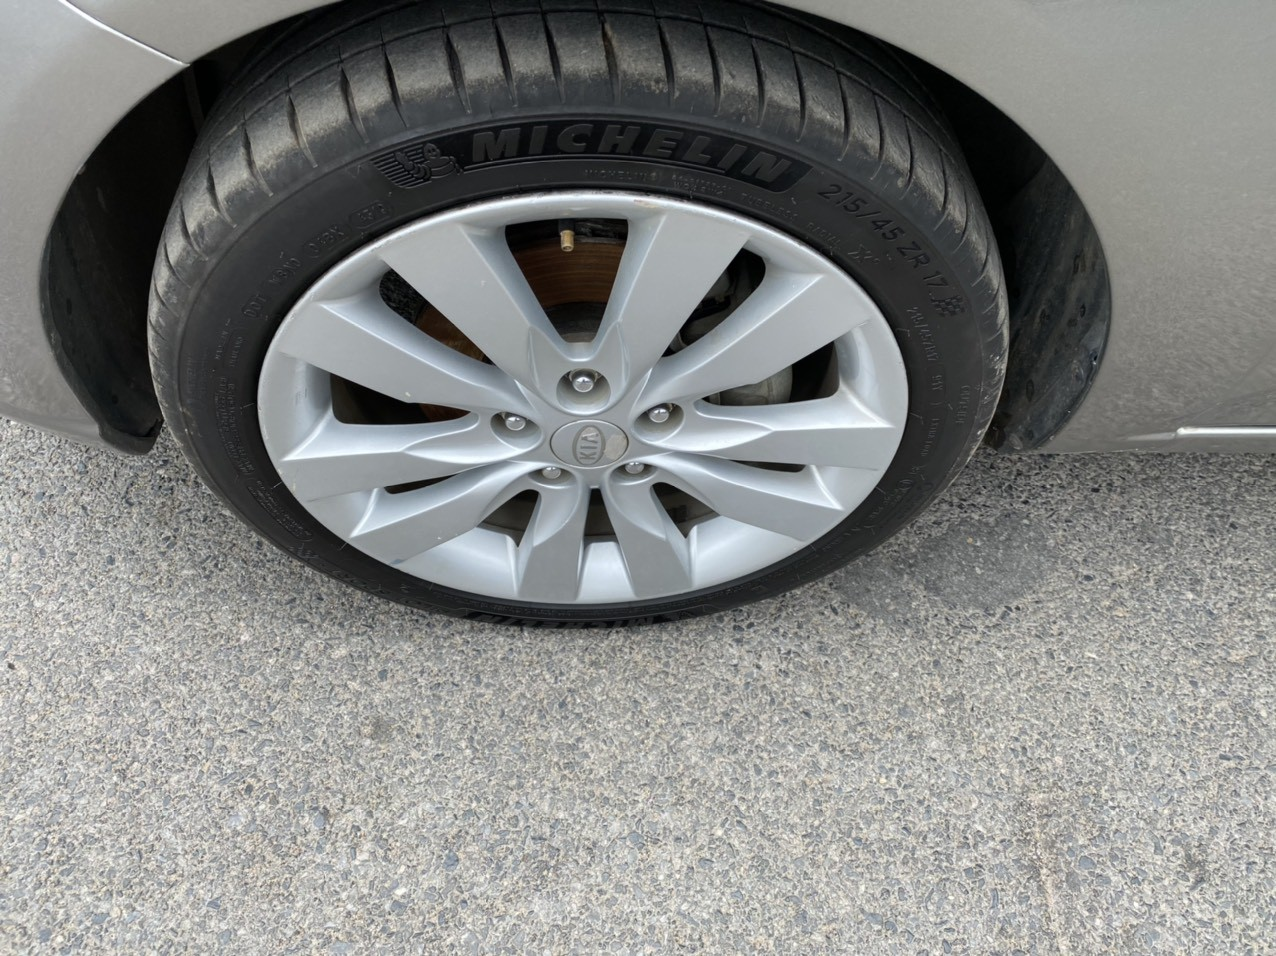 Cần bán Kia Forte SLI 2009, màu xám, xe nhập